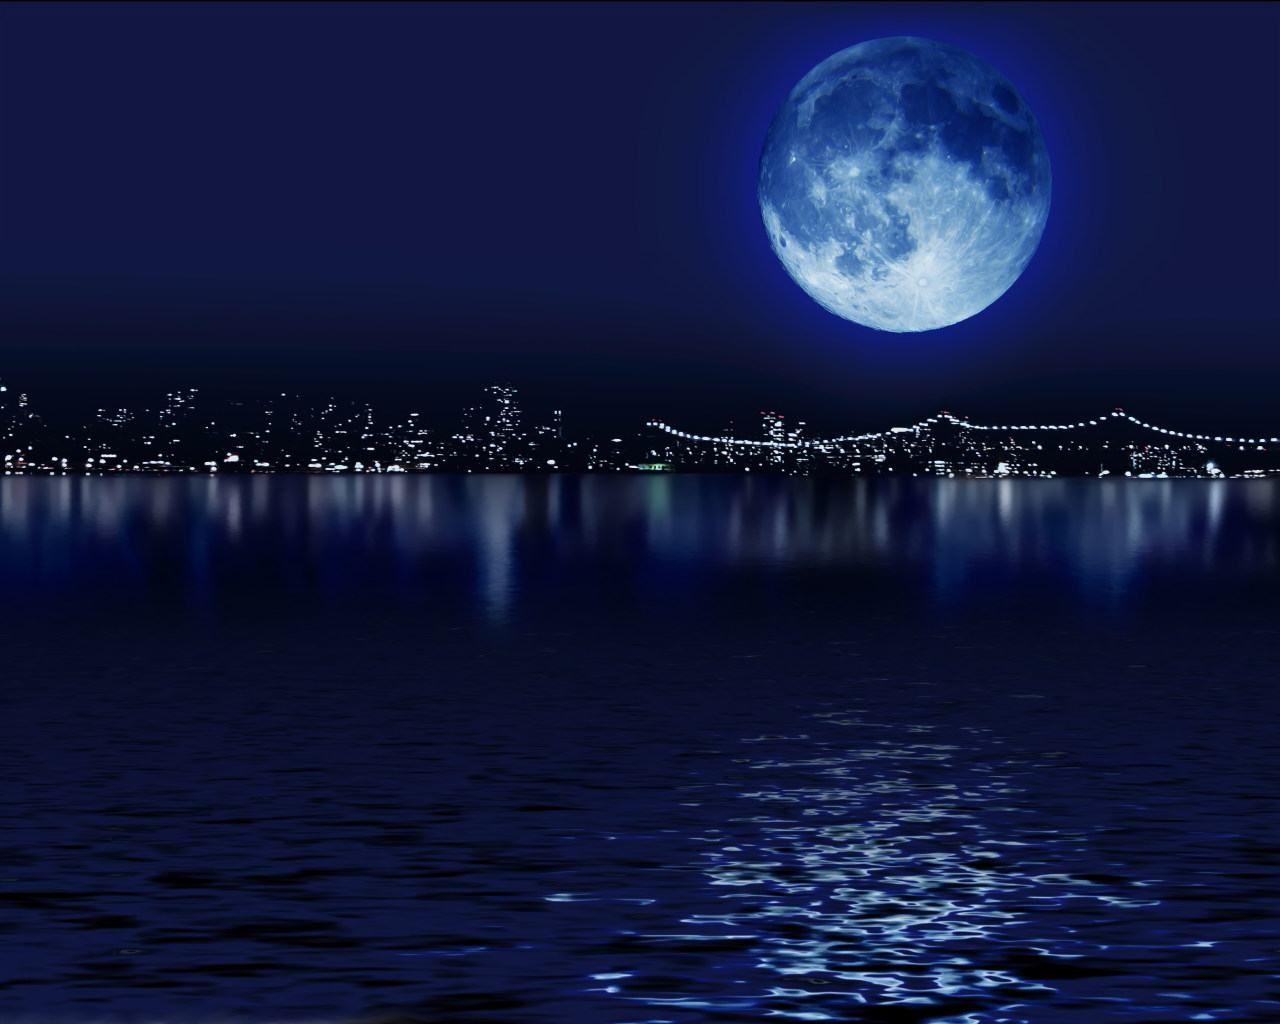 Dark Night Blue Moon Wallpaper Hd Wallpapers Backgrounds Dark N Beautiful Moon Blue Moon Moon